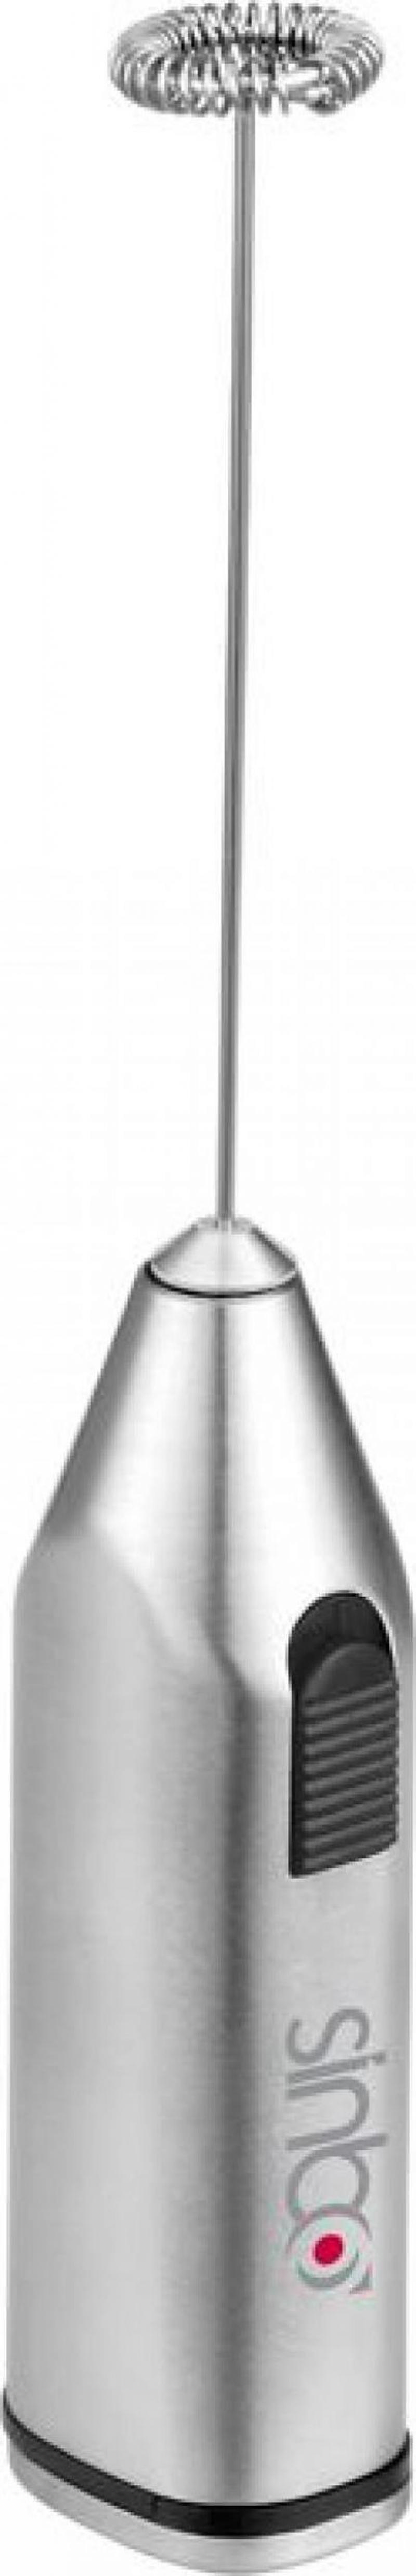 Миксер ручной Sinbo STO 6516 серебристый